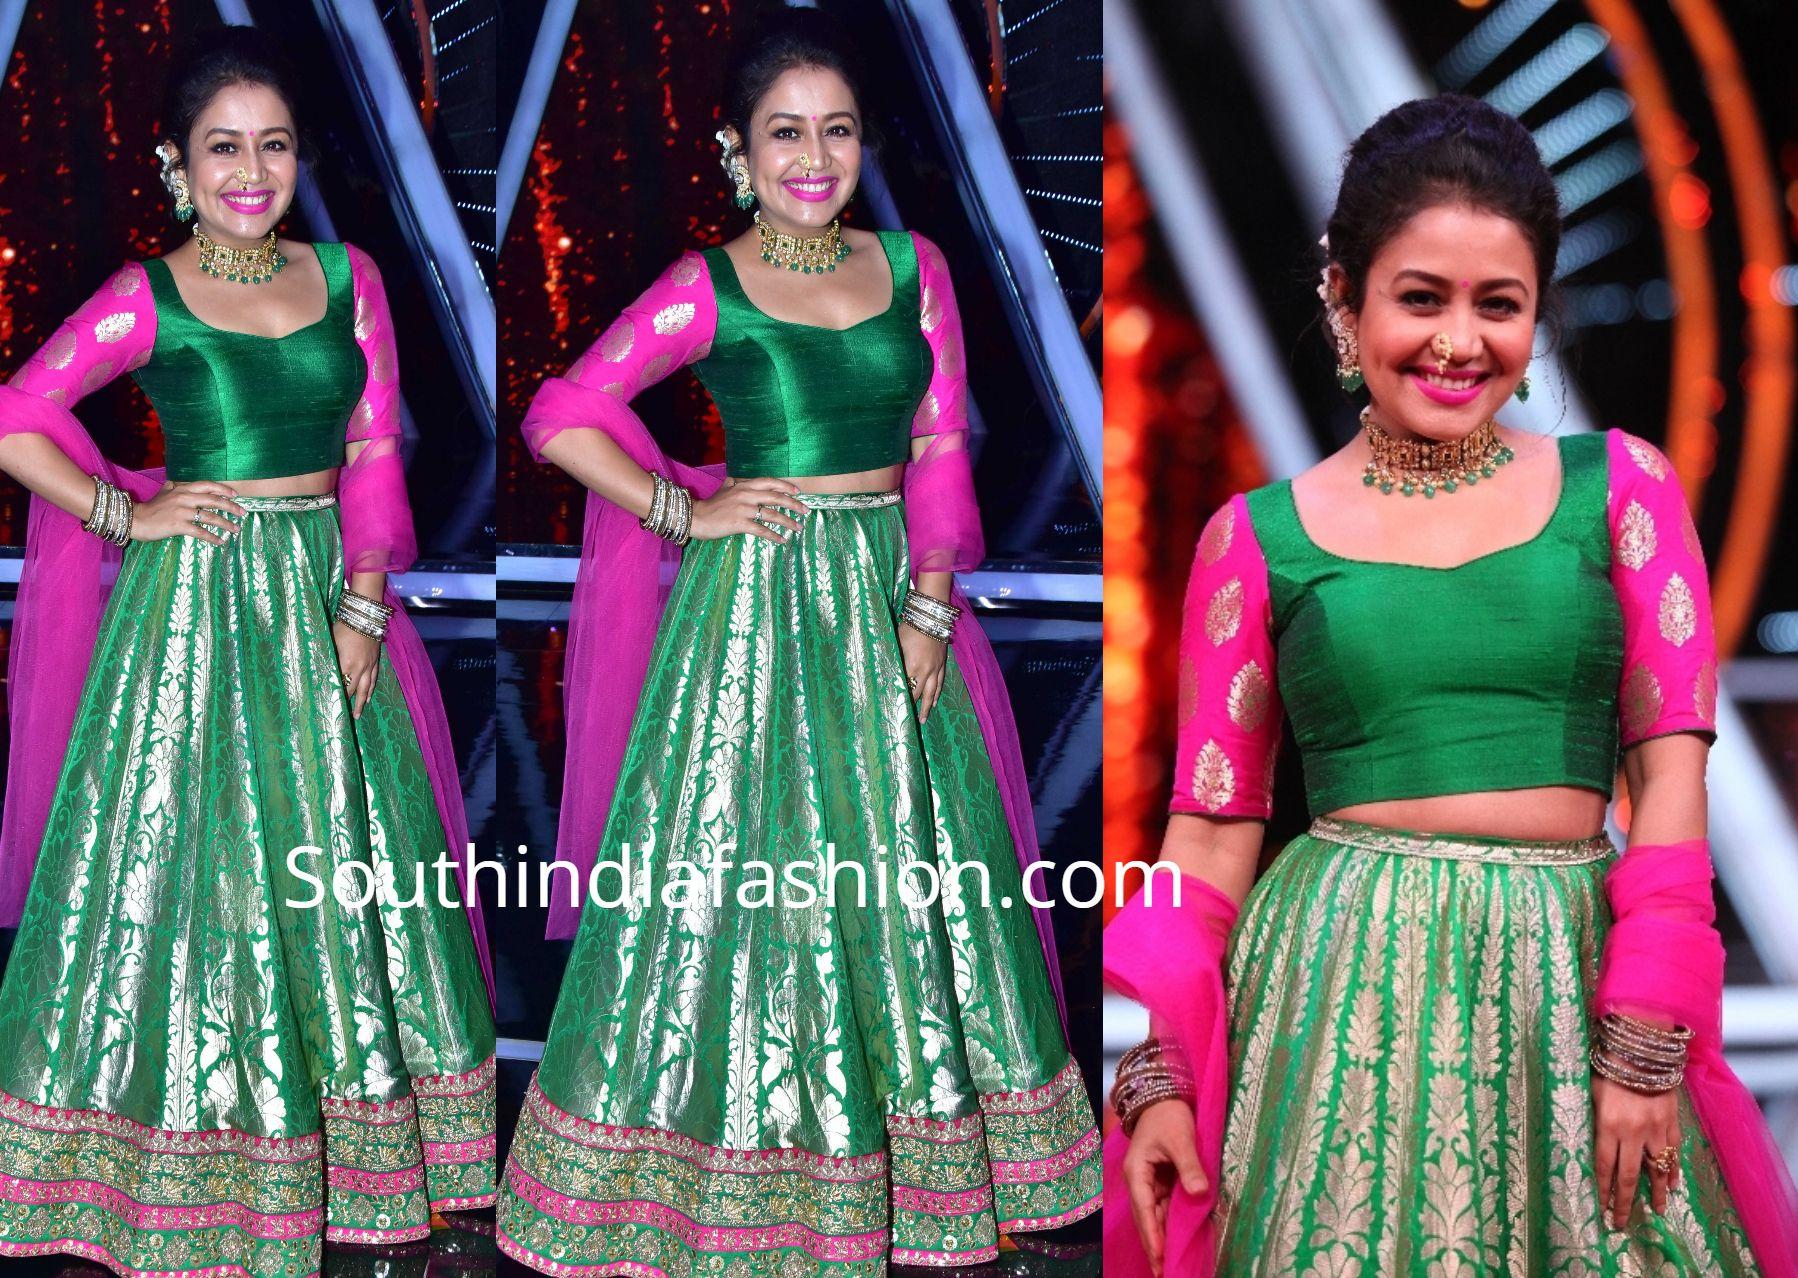 Neha Kakkar In A Green Lehenga South India Fashion Green Lehenga Neha Kakkar Dresses Lehenga